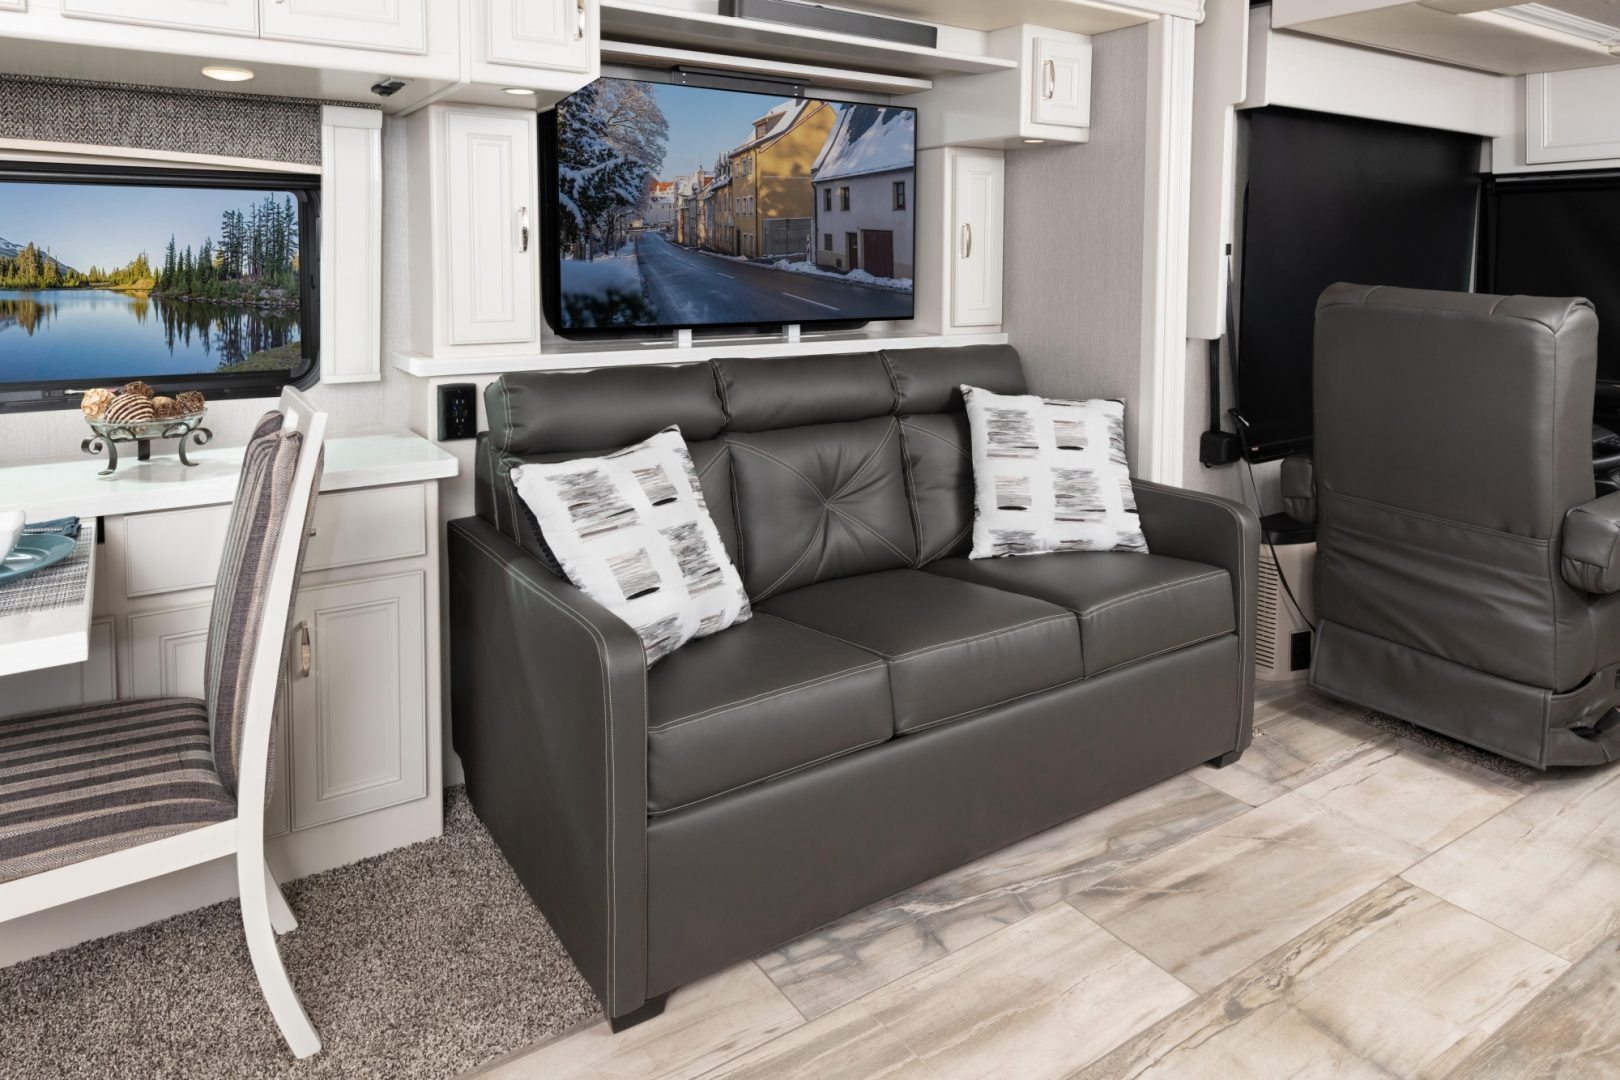 5 sofa TV Endeavor38 W Savan Fossil MY22 8623